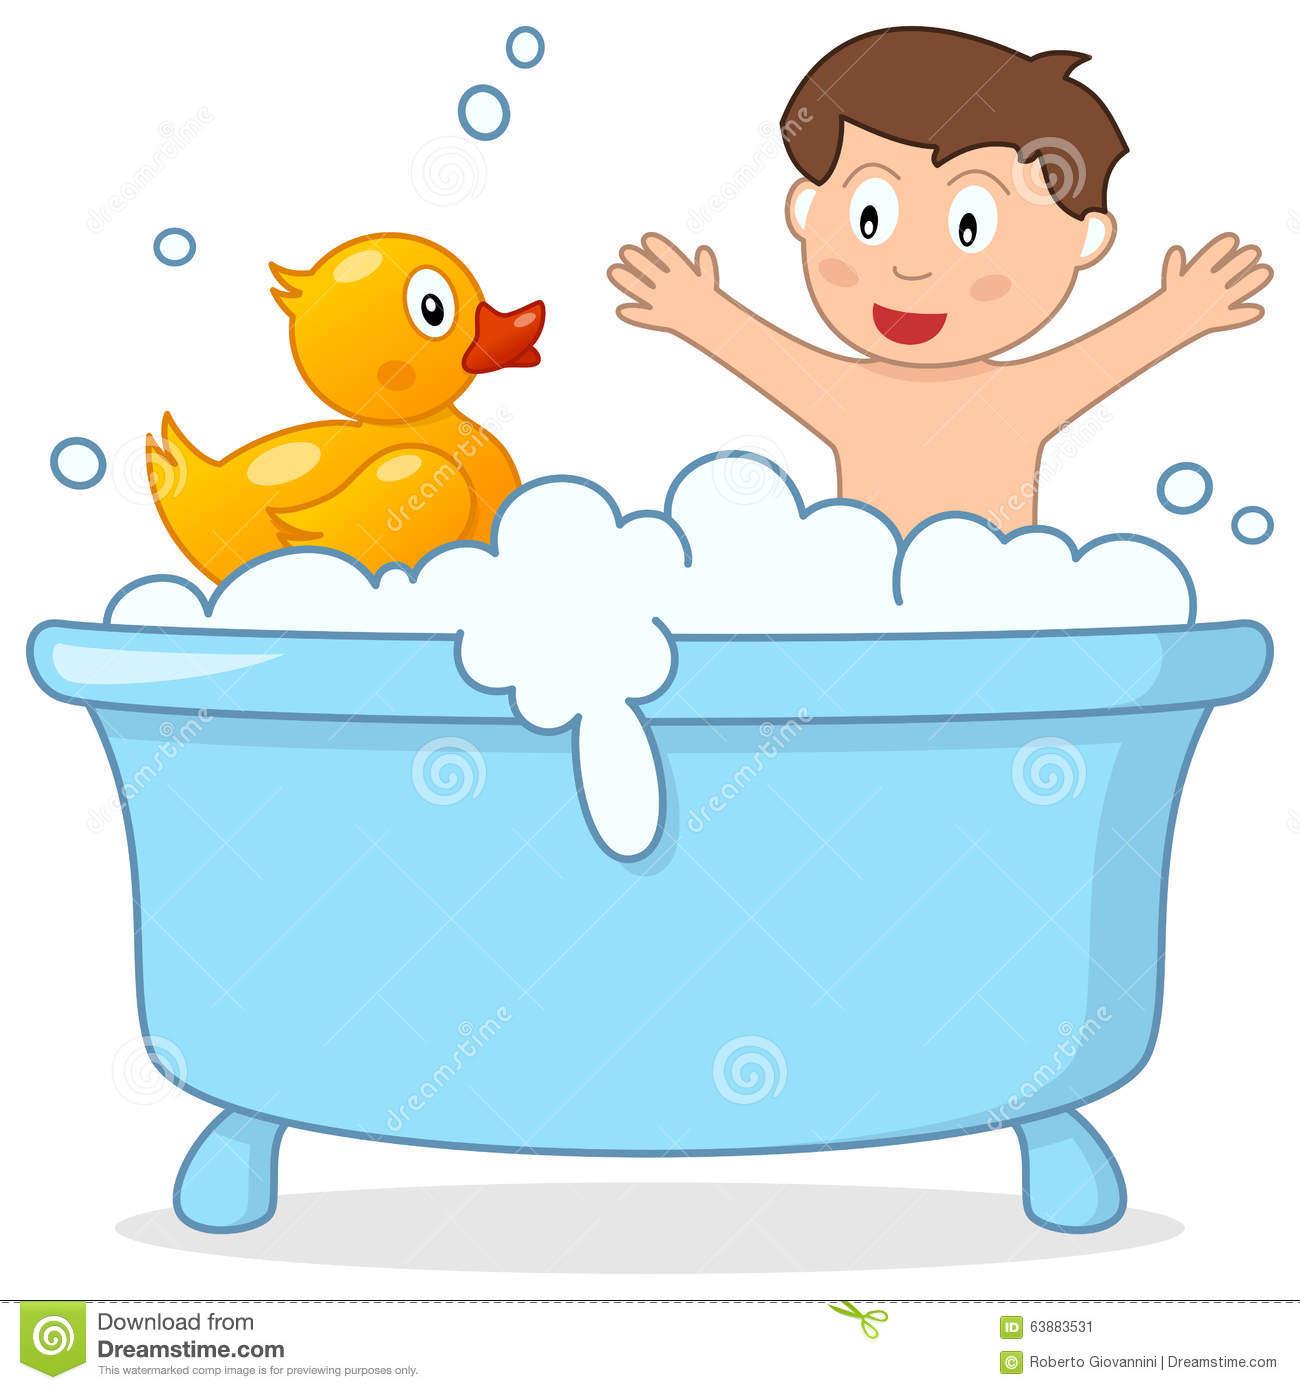 Bathtime clipart graphic freeuse download 98+ Bath Time Clipart | ClipartLook graphic freeuse download